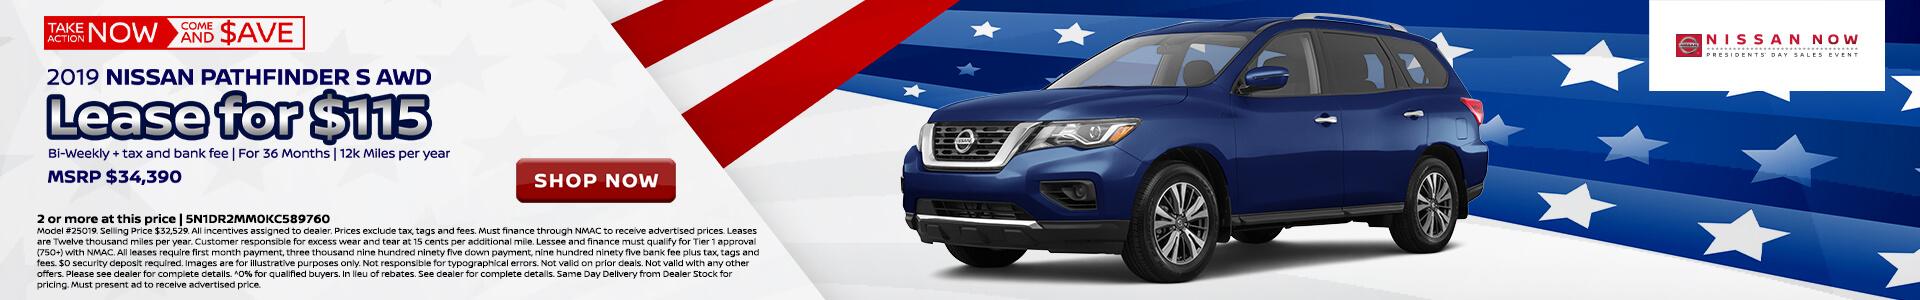 Nissan Pathfinder $230 Lease